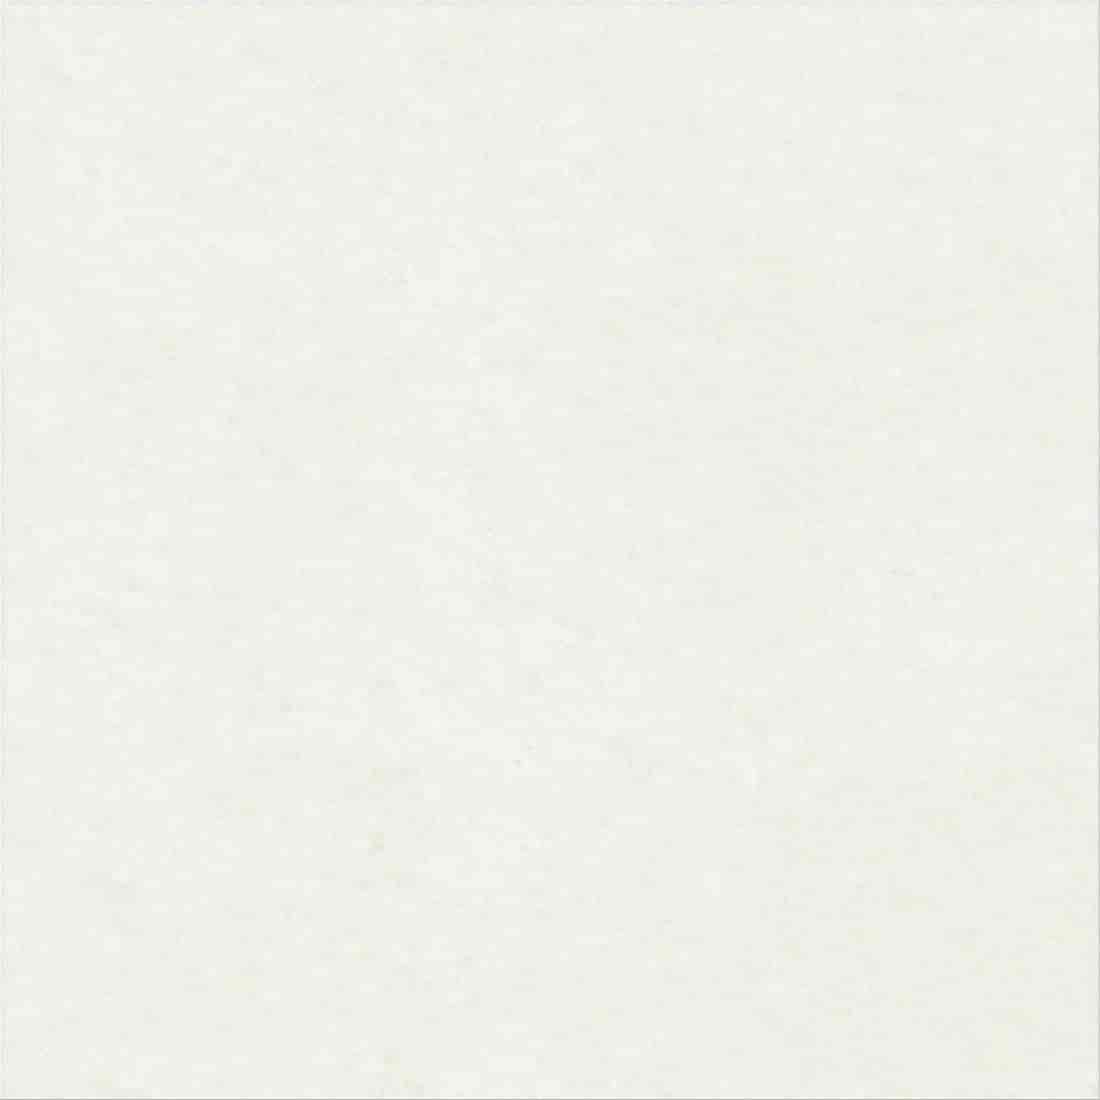 Buy johnson snow allure 80 x 80 cm vitrified floor tile off white johnson snow allure 80 x 80 cm vitrified floor tile off white hrj2832151 dailygadgetfo Images